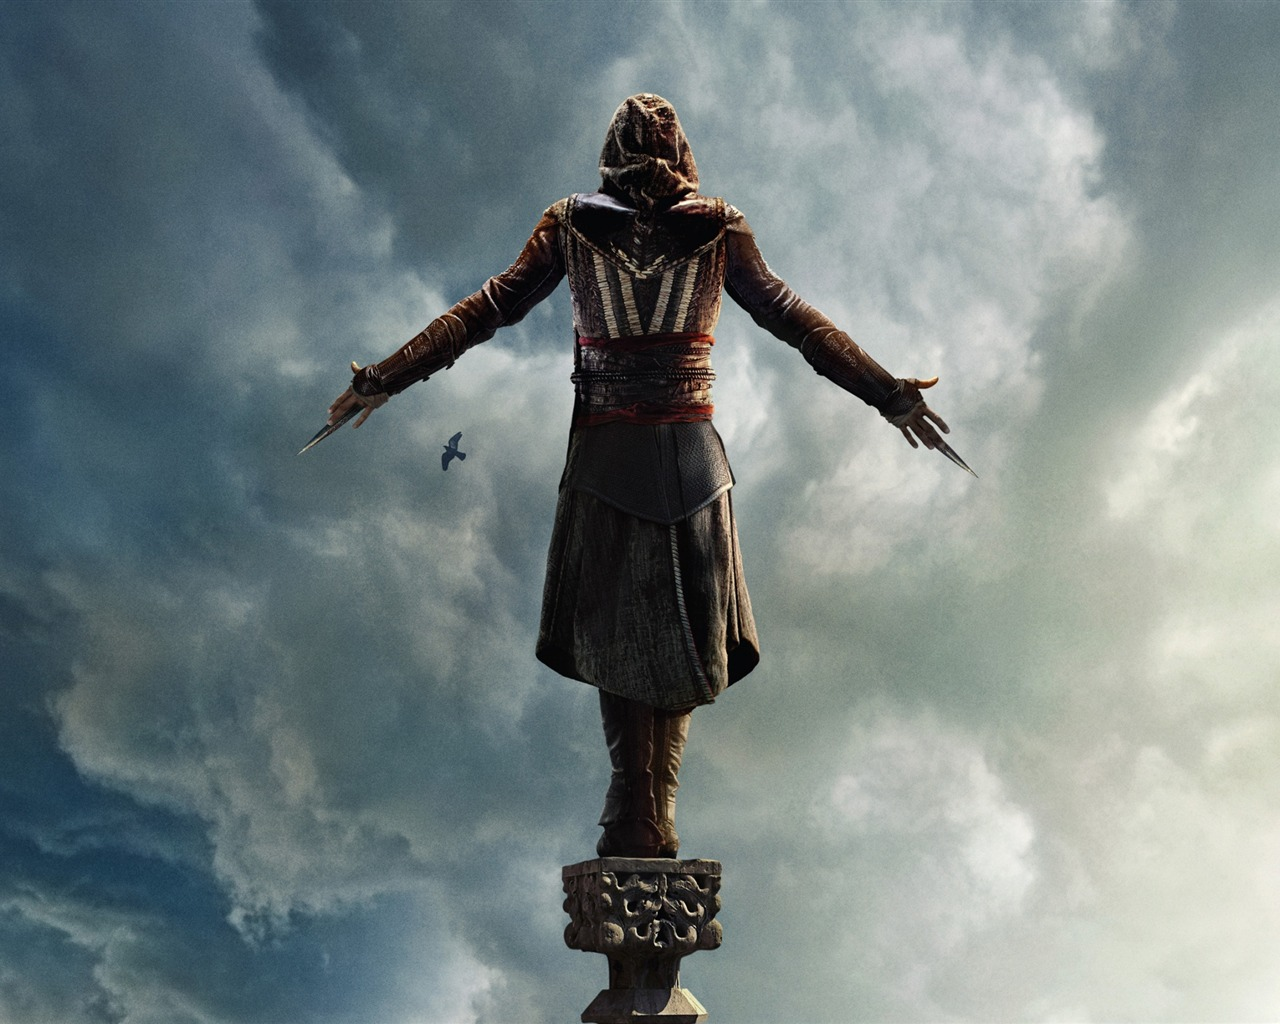 刺客信条 Assassin's Creed 2016-电影海报高清壁纸预览 | 10wallpaper.com